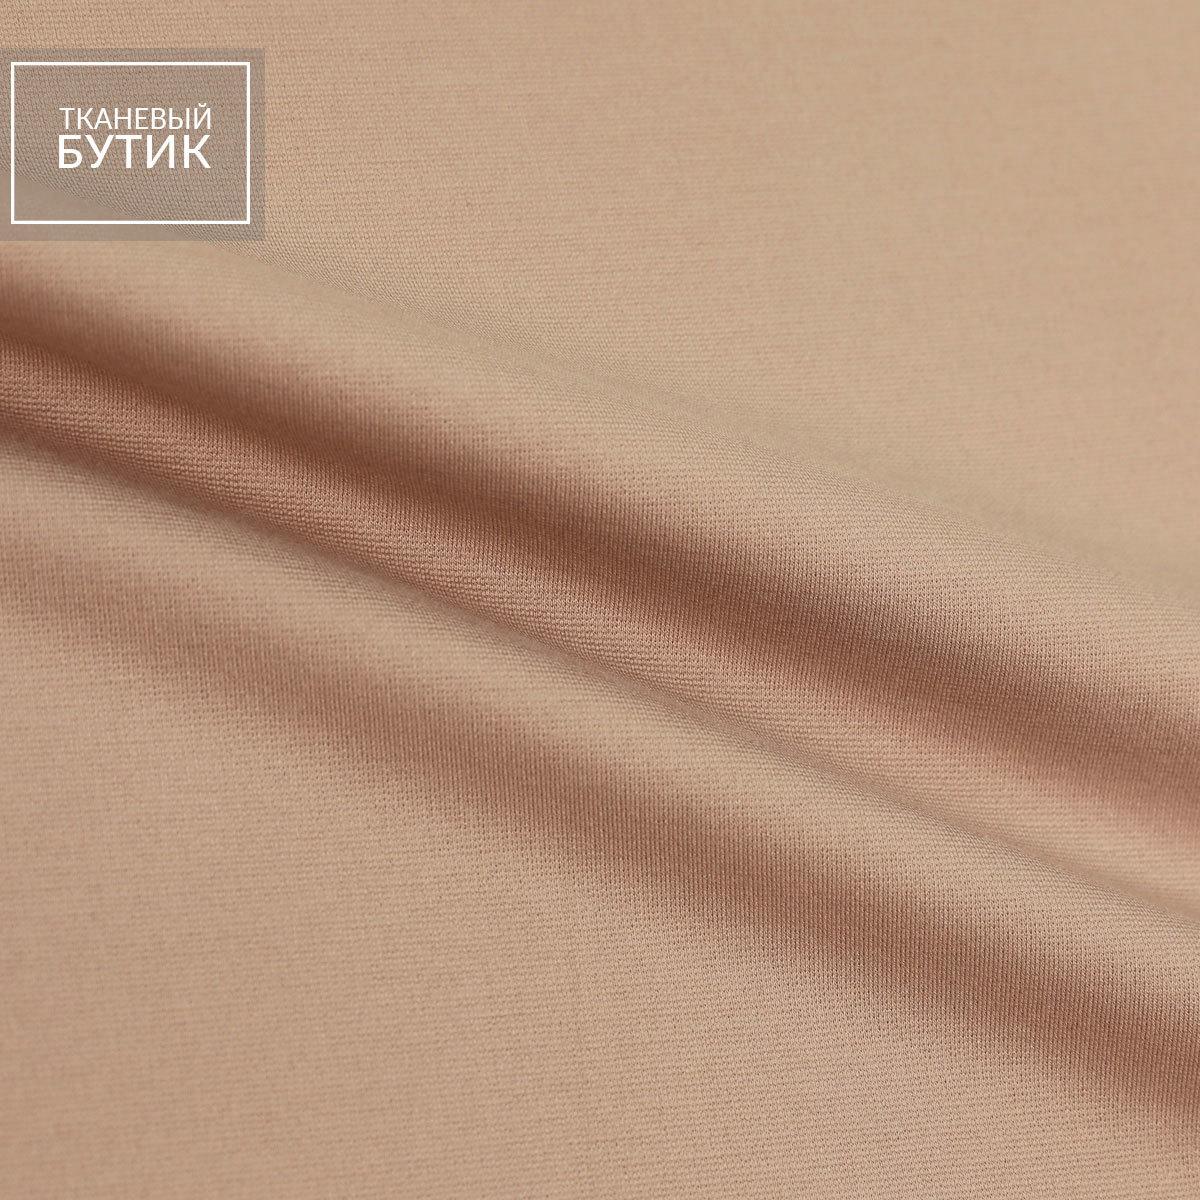 Розовое вискозное стретч-джерси с нейлоном